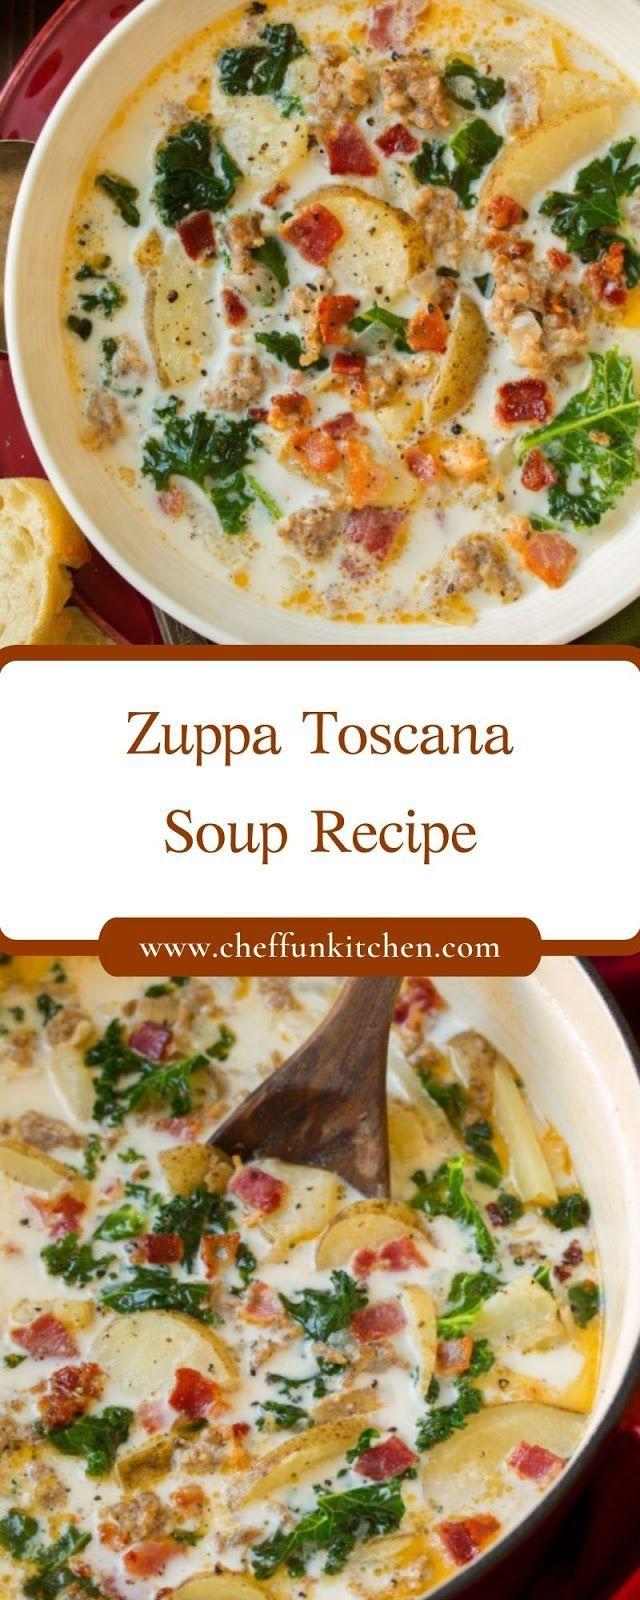 Zuppa Toscana Soup Recipe #zuppatoscanasoup Zuppa Toscana Soup Recipe #zuppatoscanasoup